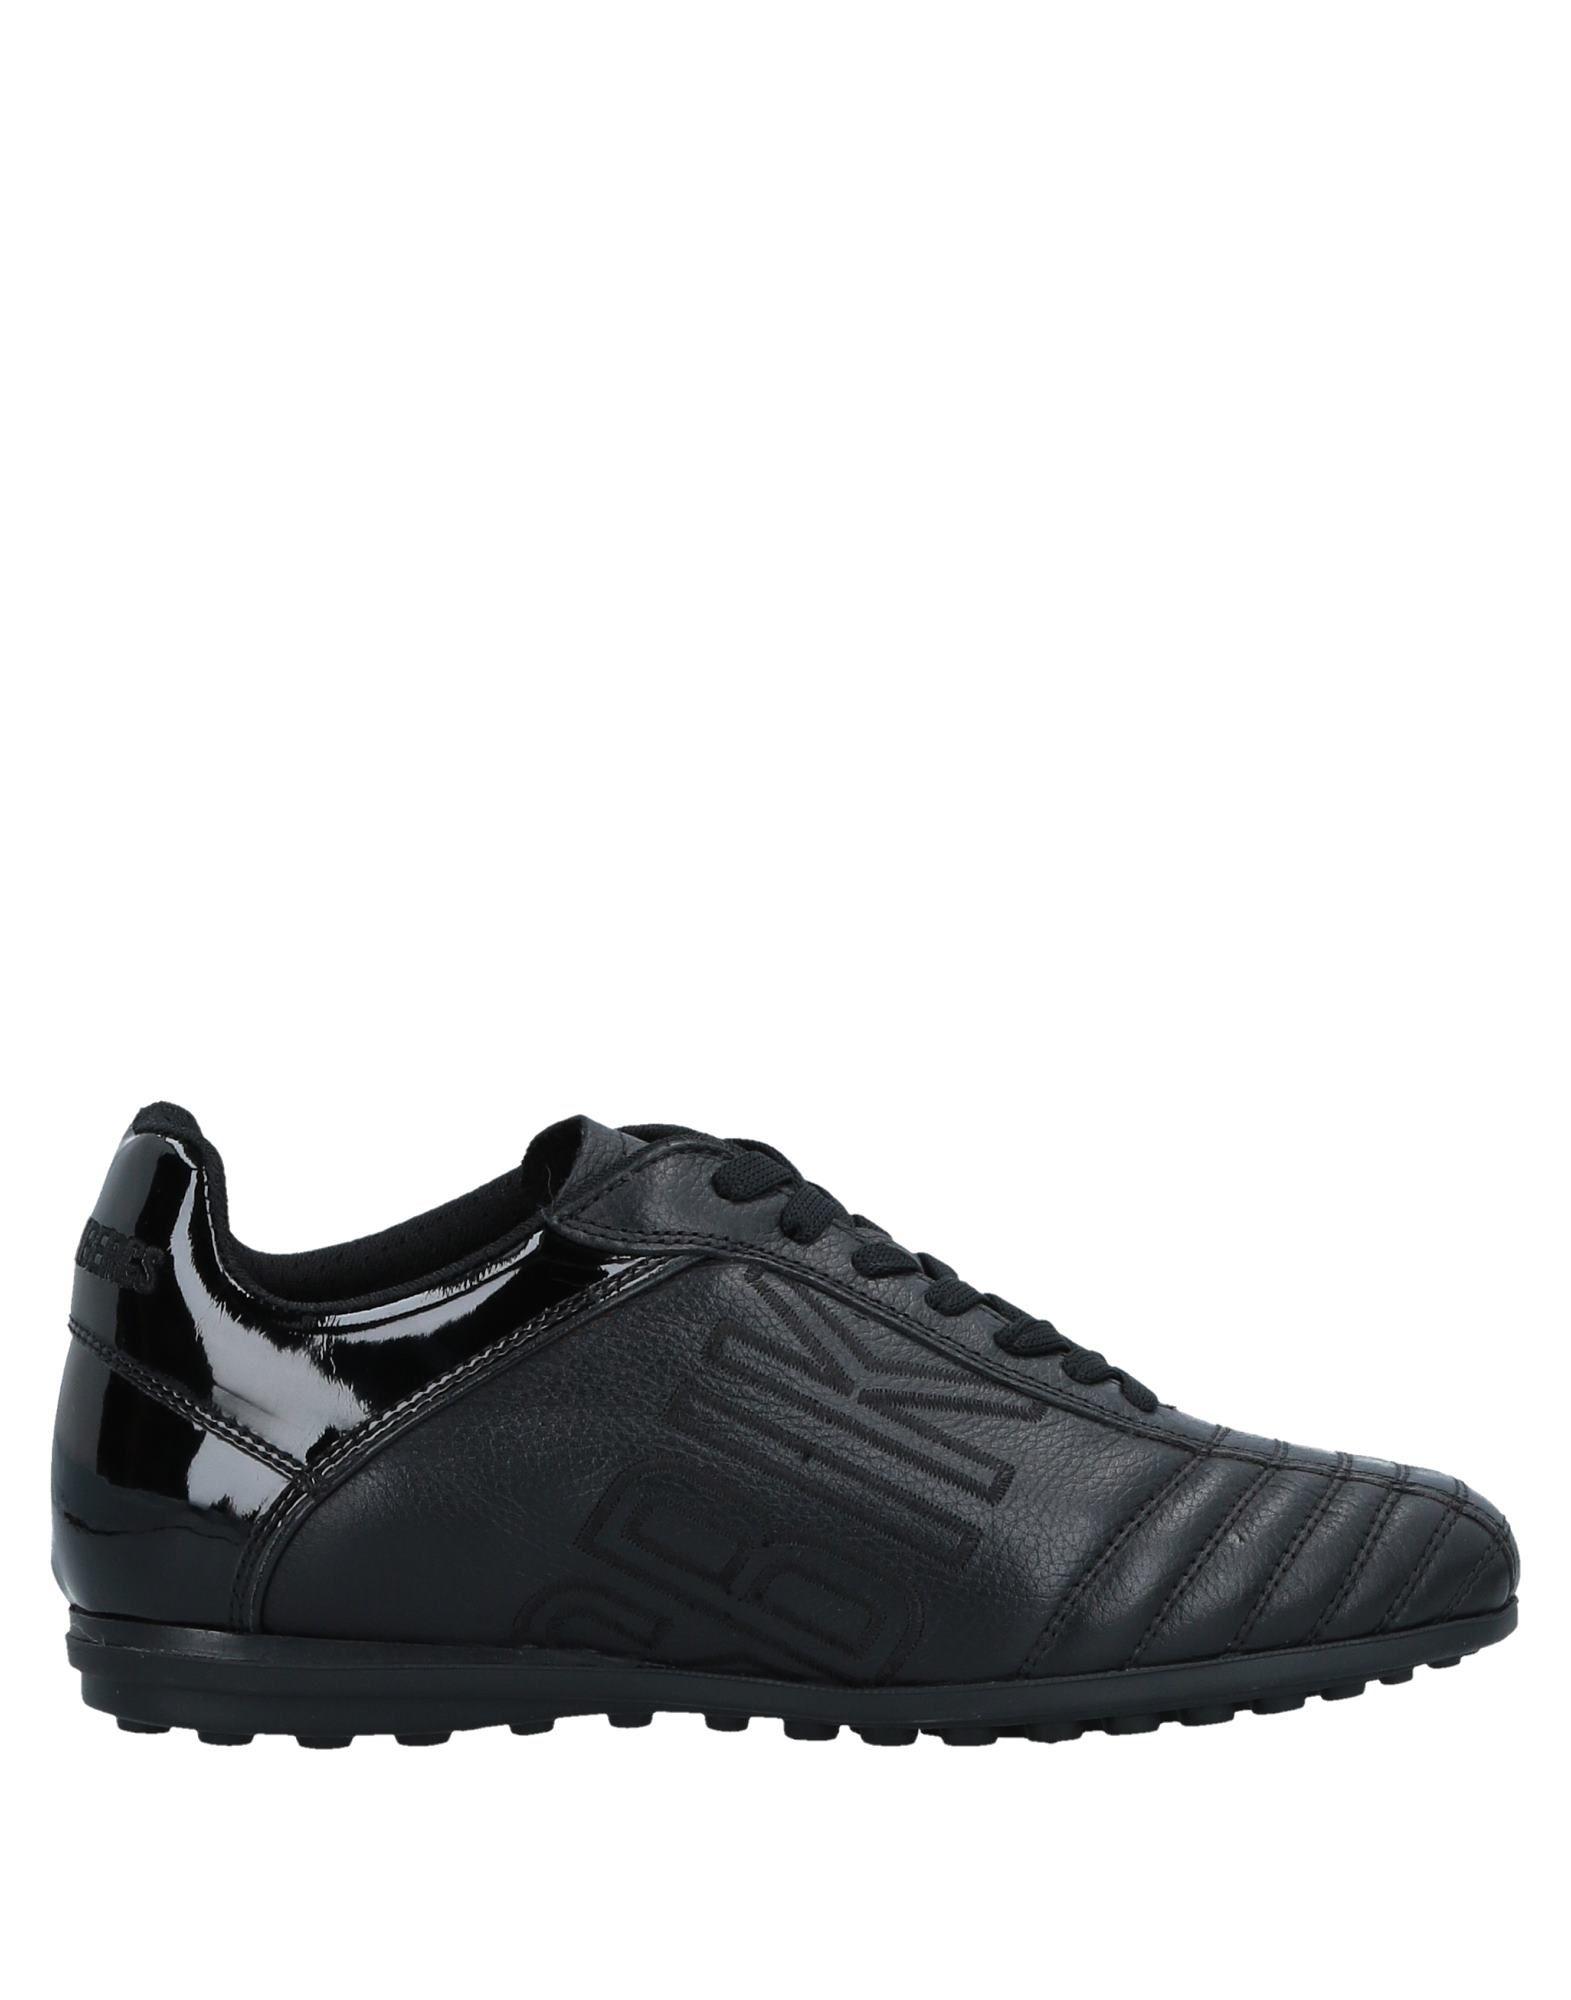 Stilvolle billige Schuhe Bikkembergs Sneakers Sneakers Sneakers Damen  11522006VL c67fc0